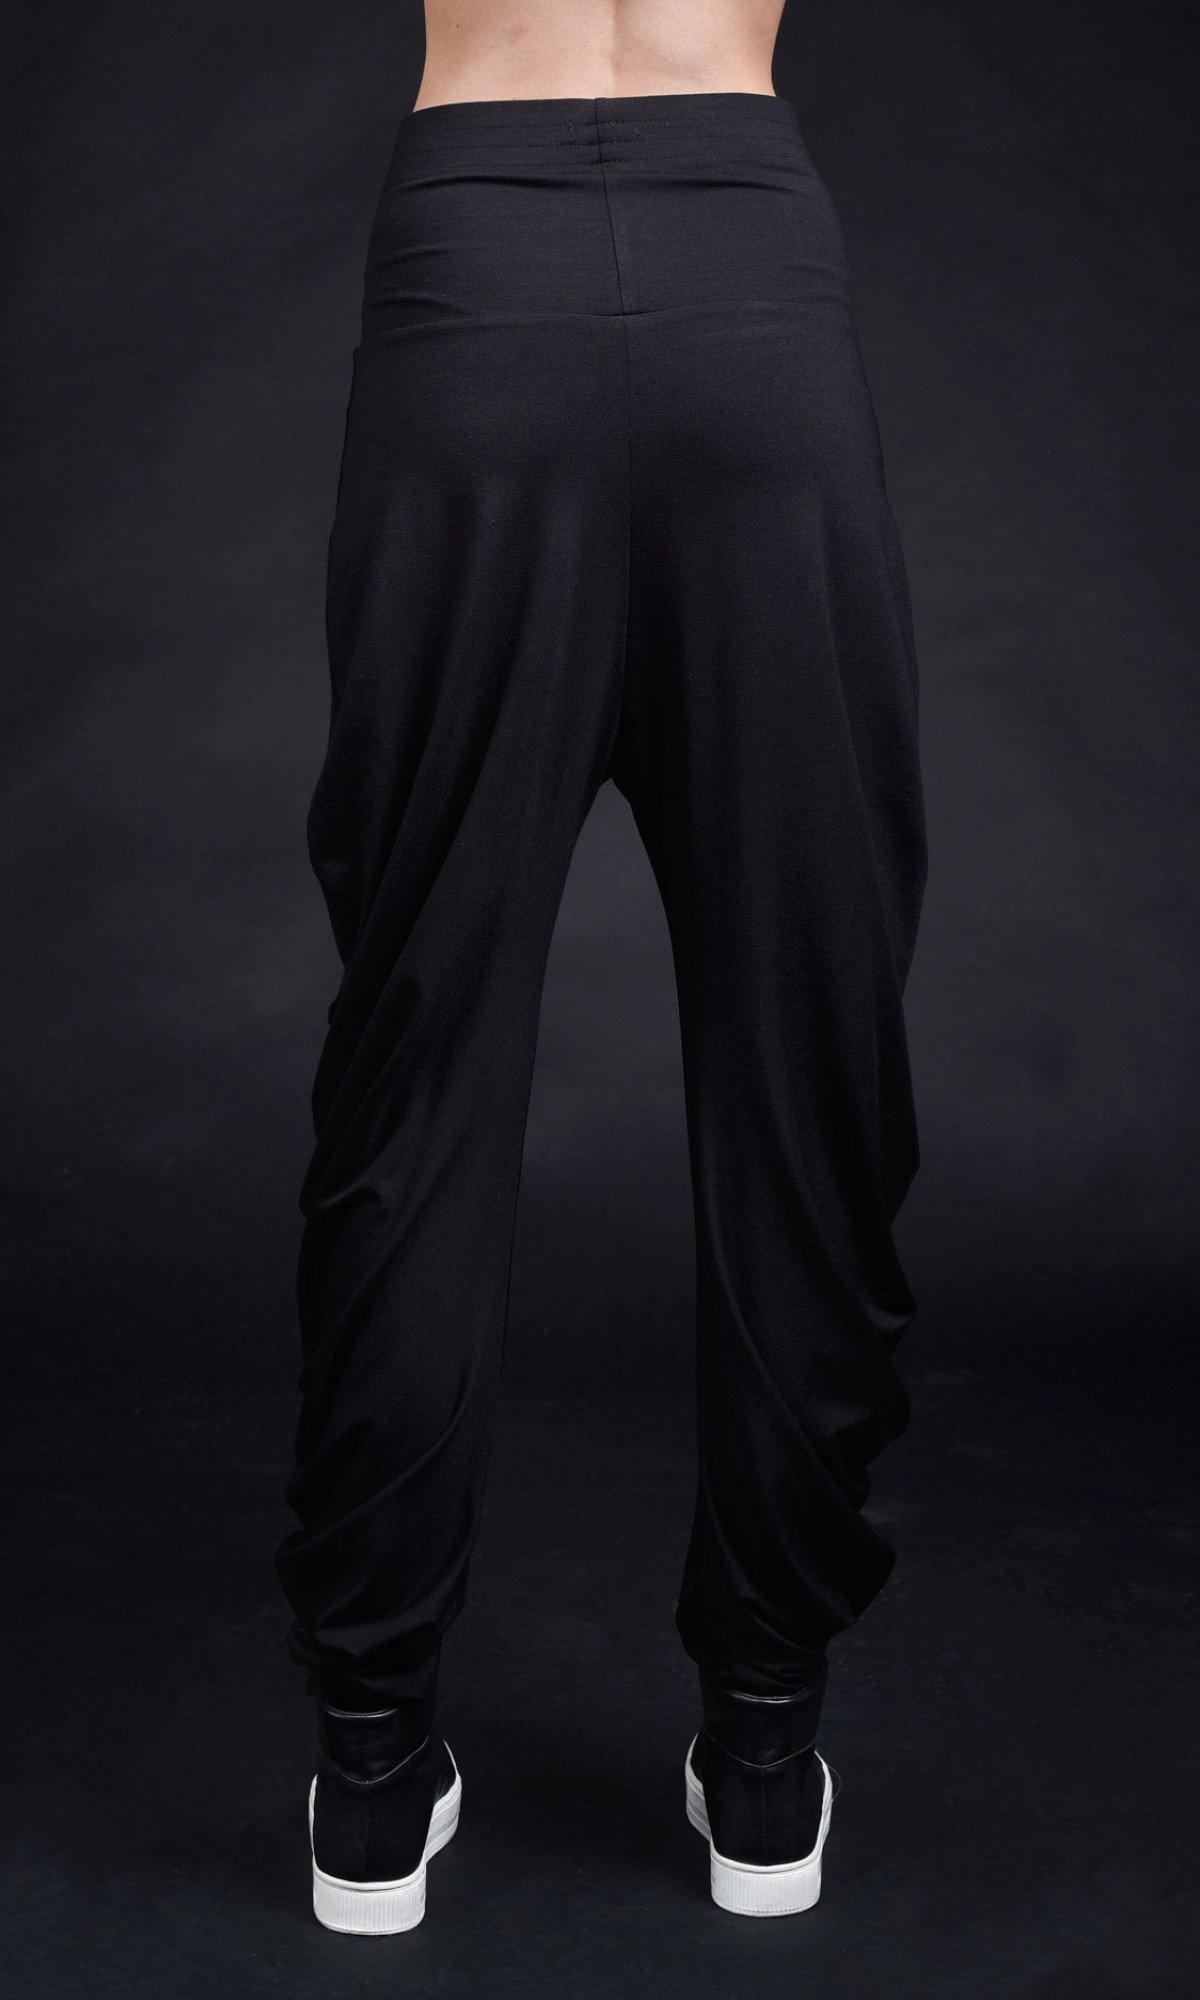 Very Elegant Buffon Pants A90435